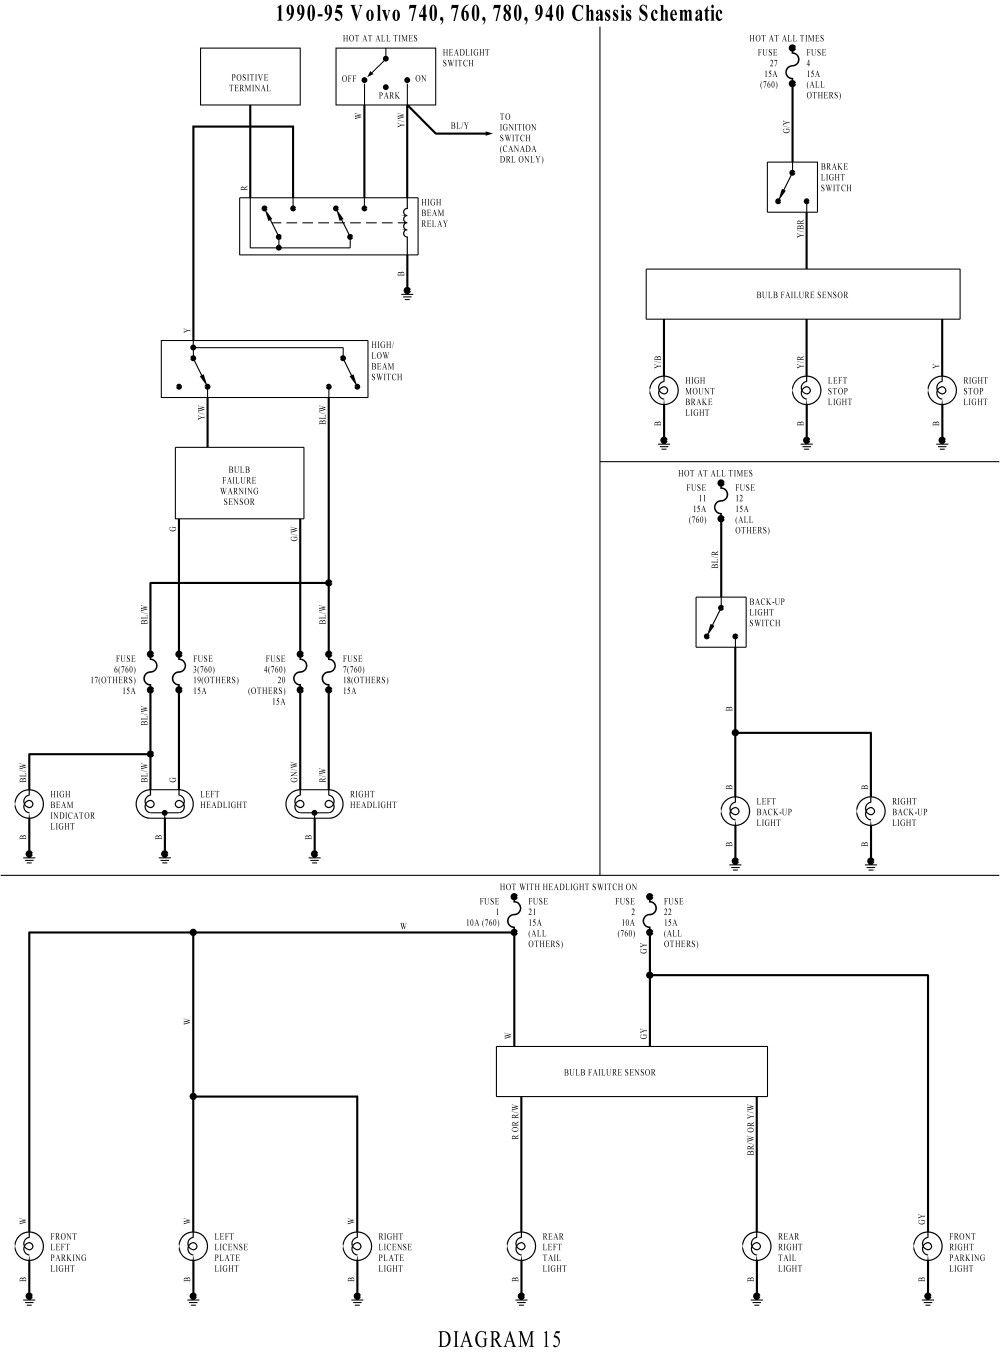 Terrific Wiring Diagram Volvo 240 Wagon Wiring Diagram Tutorial Wiring Cloud Ostrrenstrafr09Org